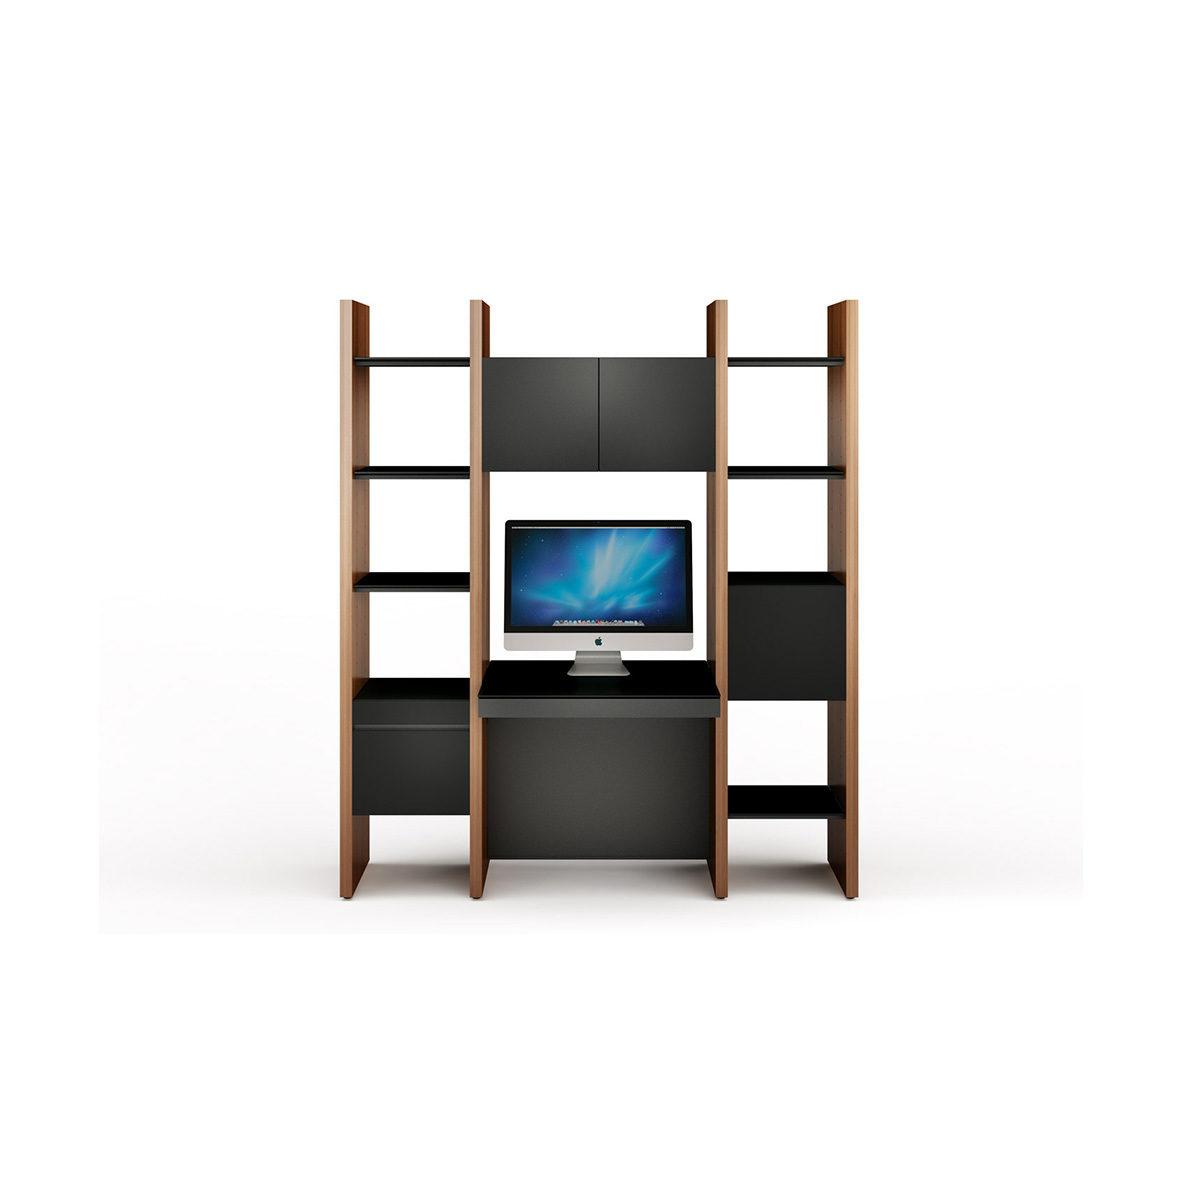 modular system furniture. Semblance 5413-DG Office System Modular Furniture I